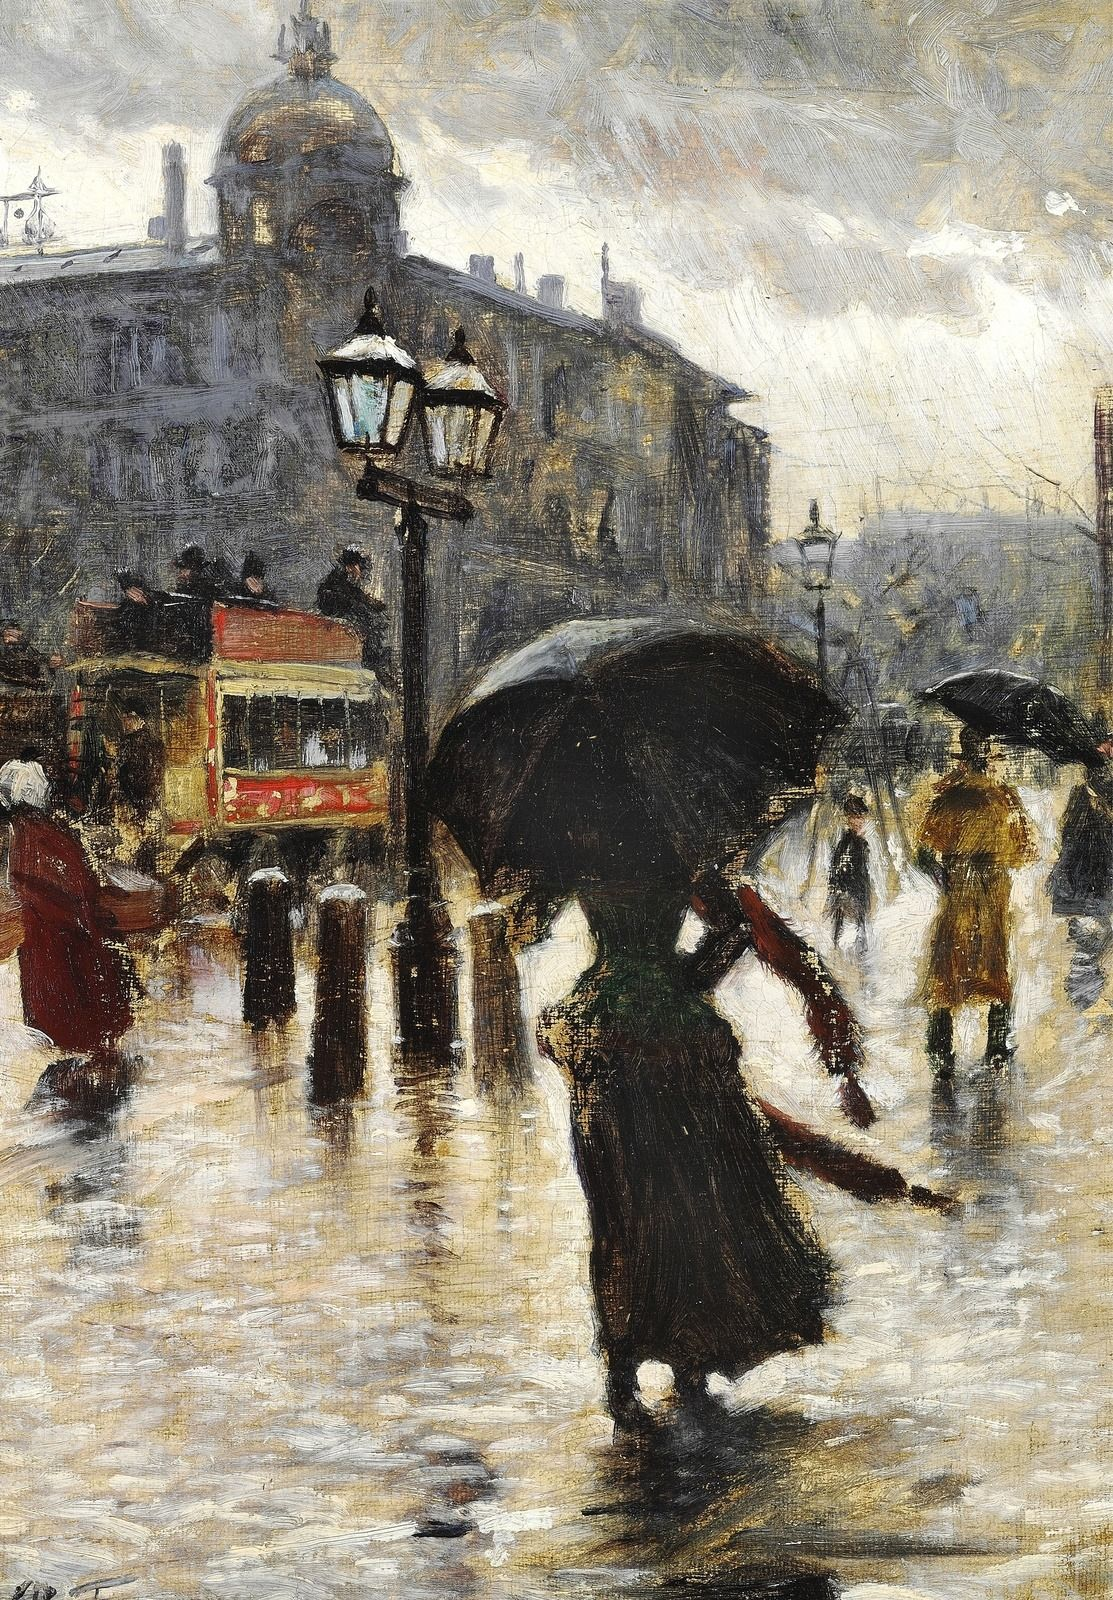 Deszcz (Robert Louis Stevenson)